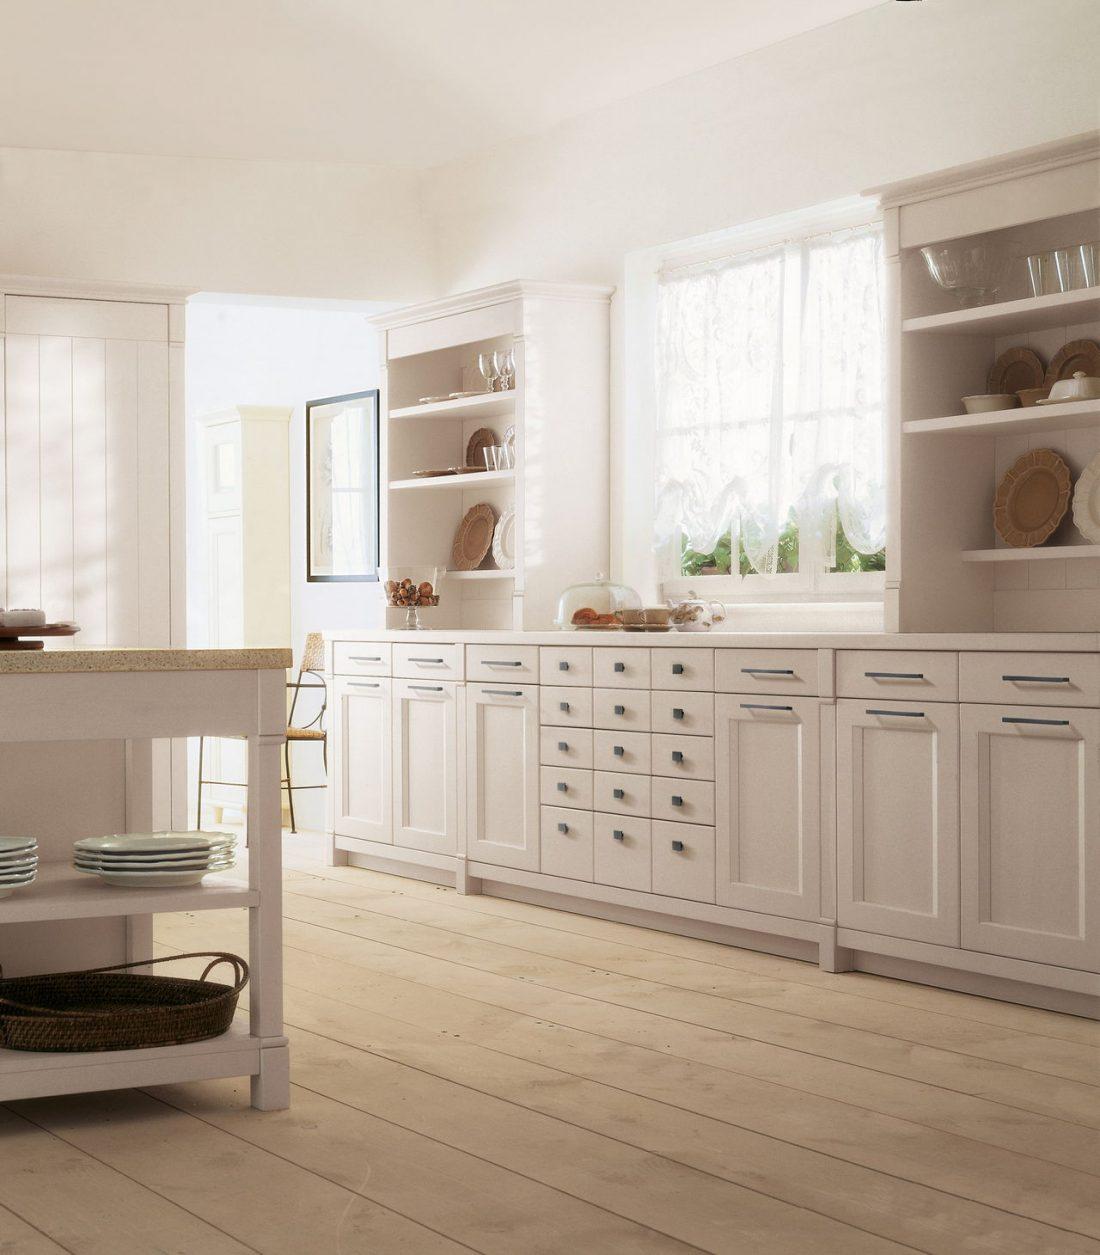 Кухня в стиле прованс 9